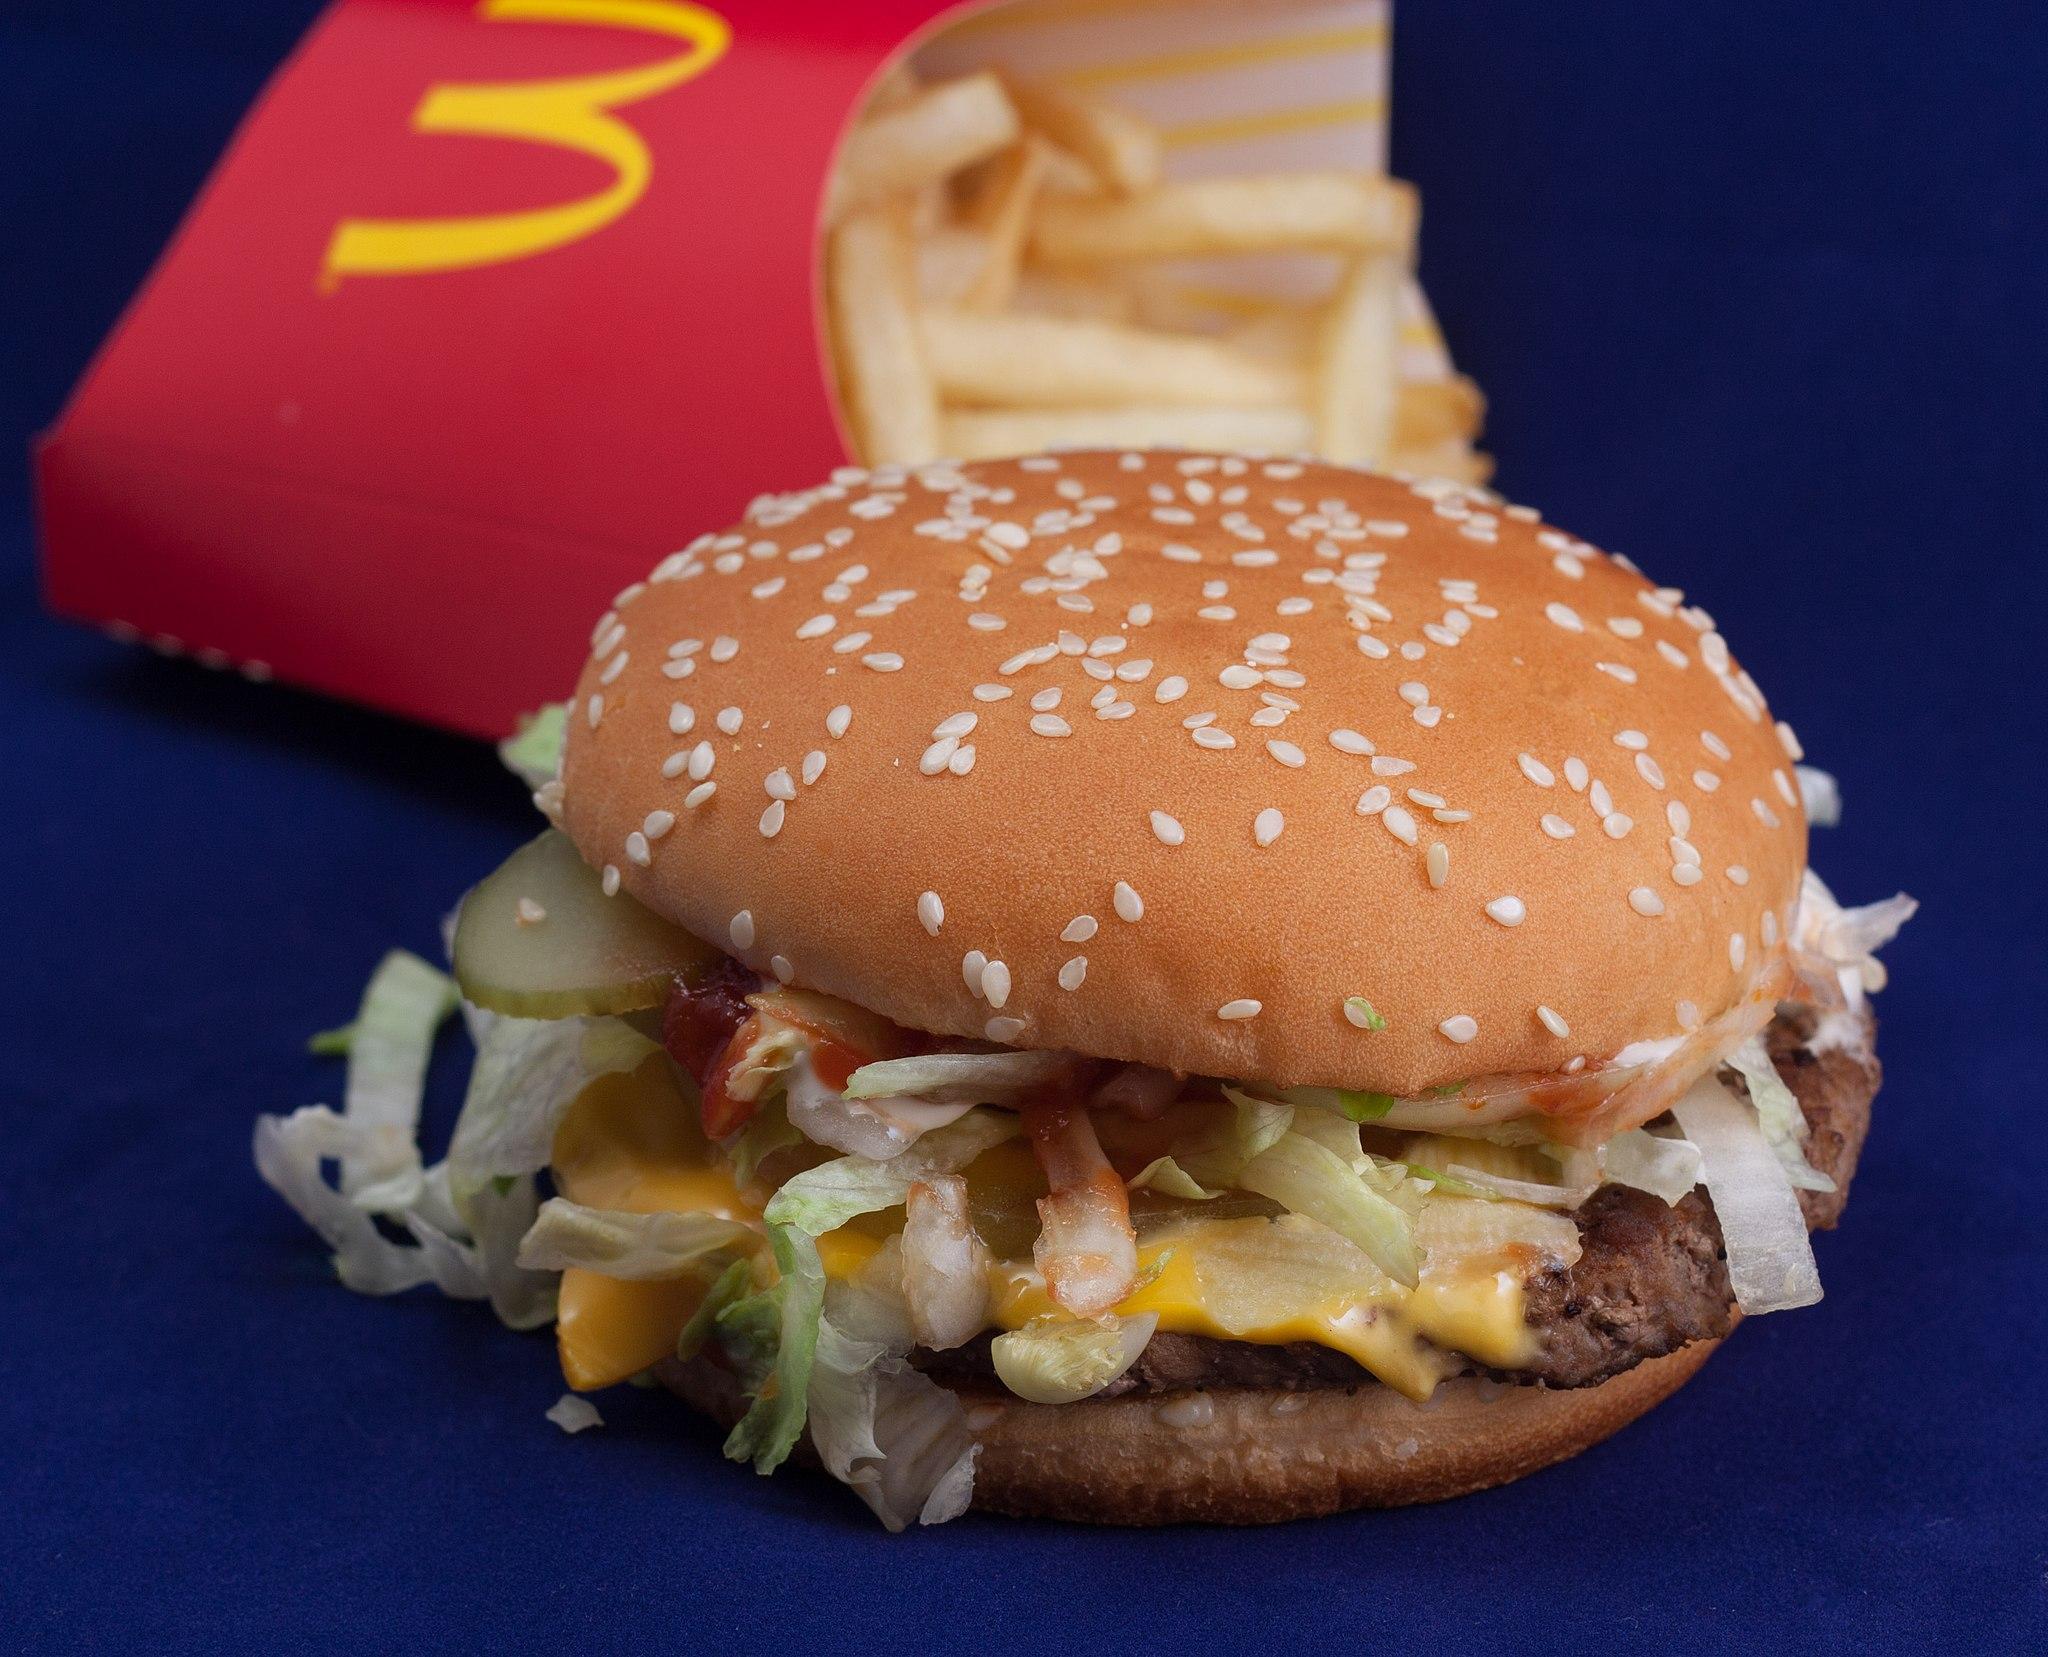 McDonald's Big N' tasty burger with fries